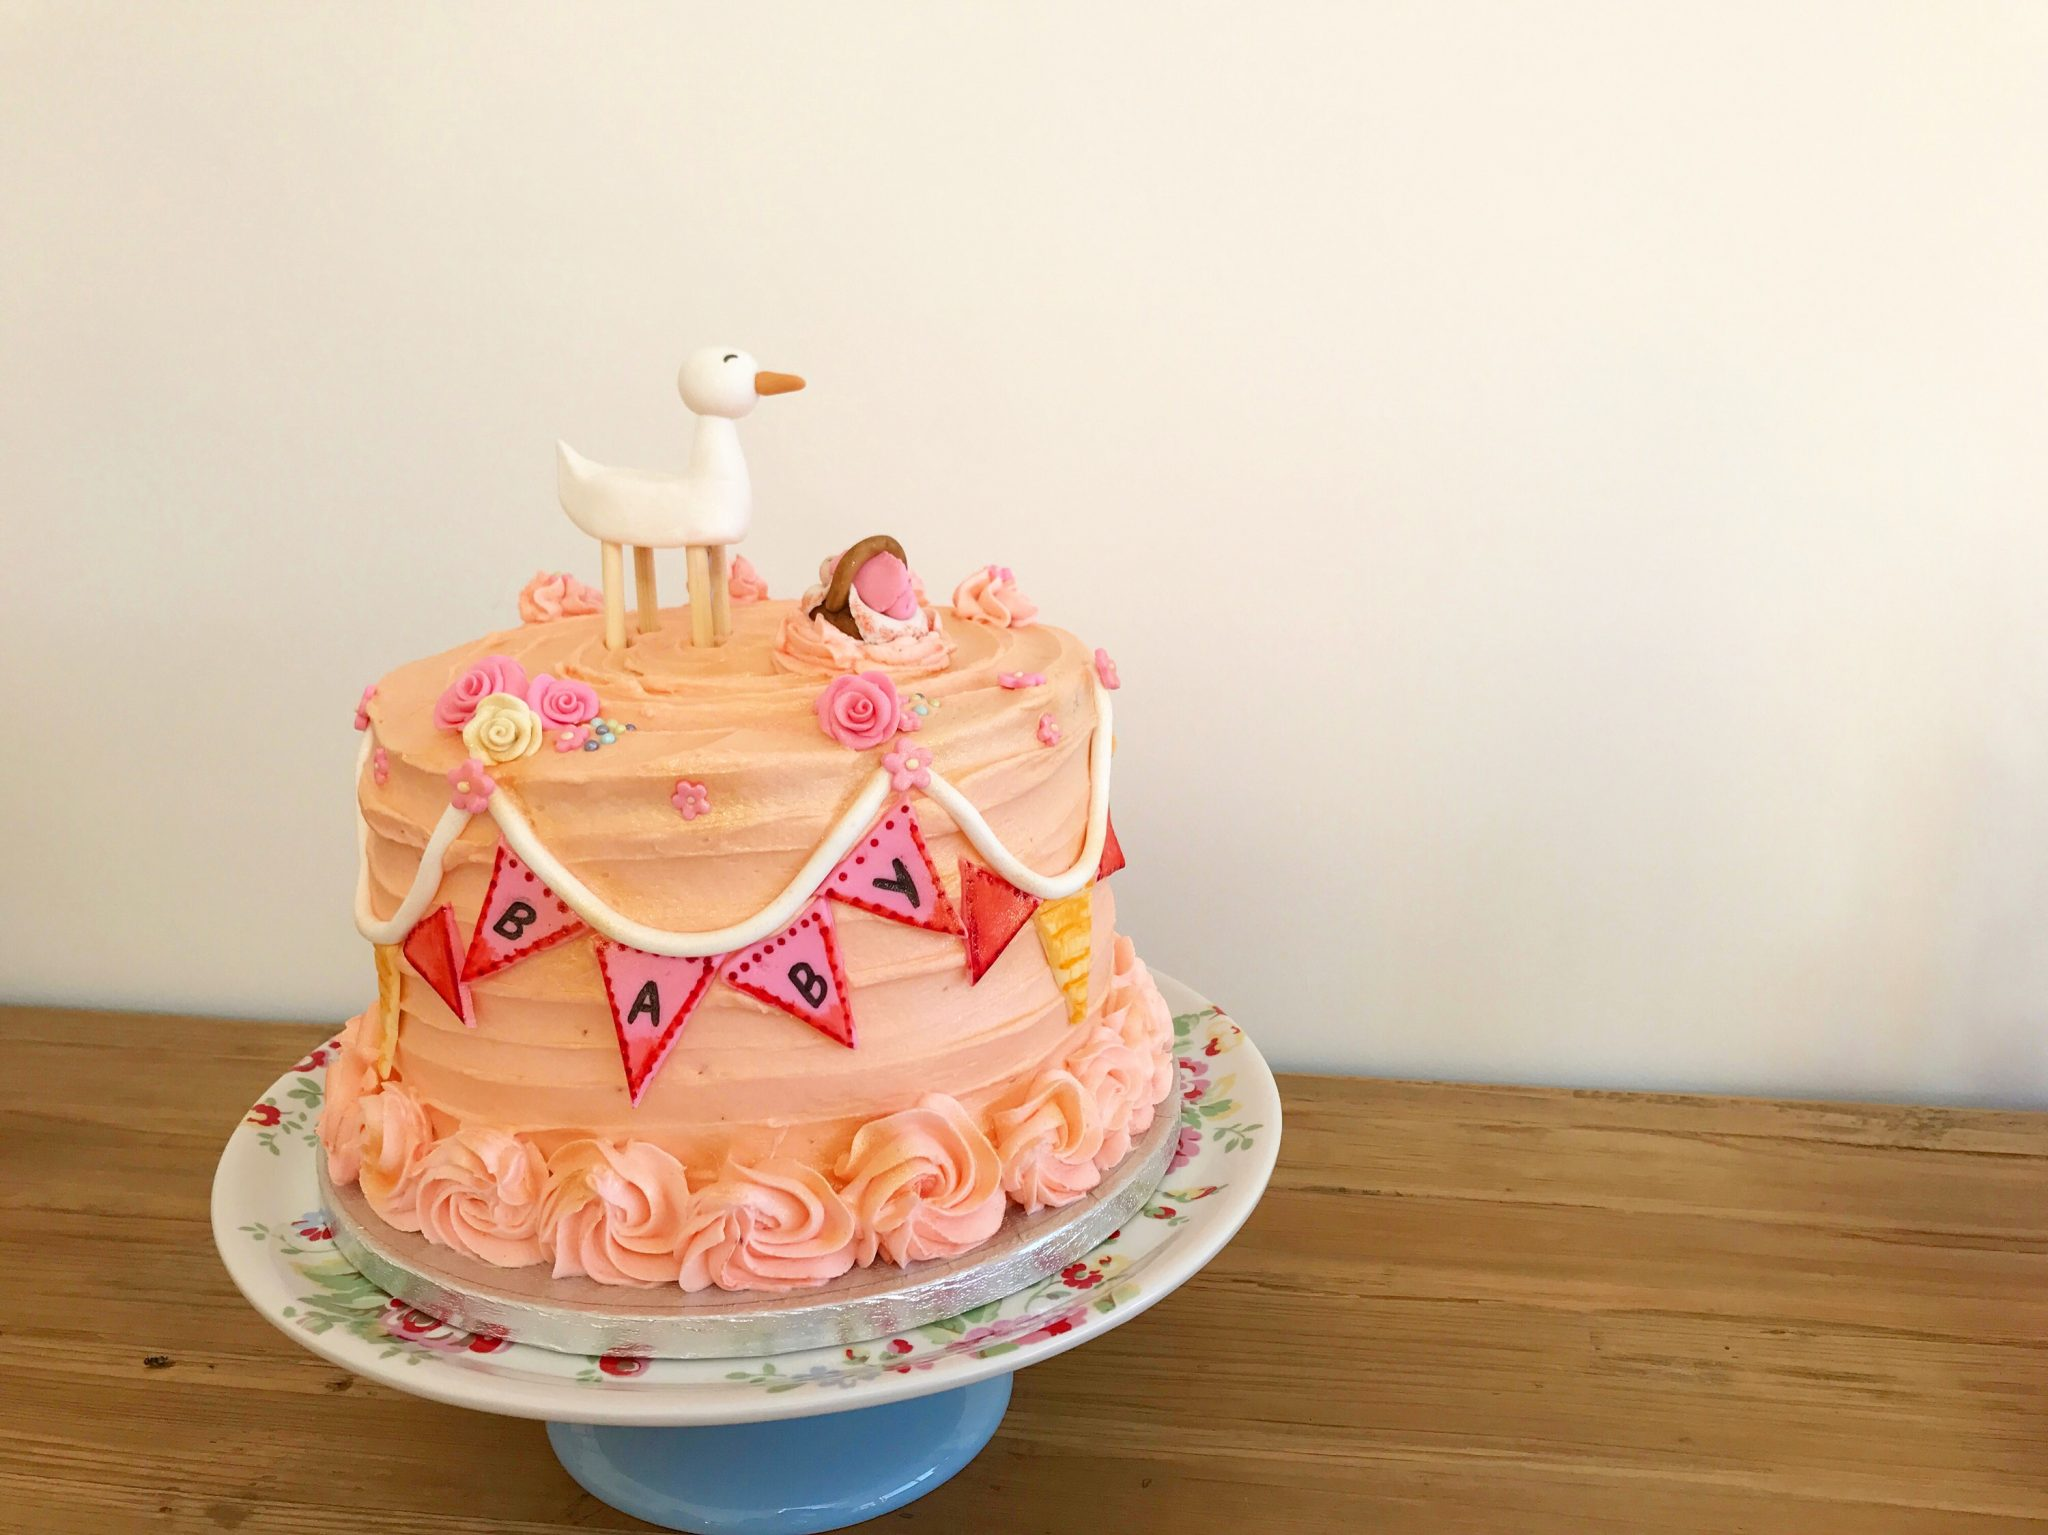 Best Celebration Cakes